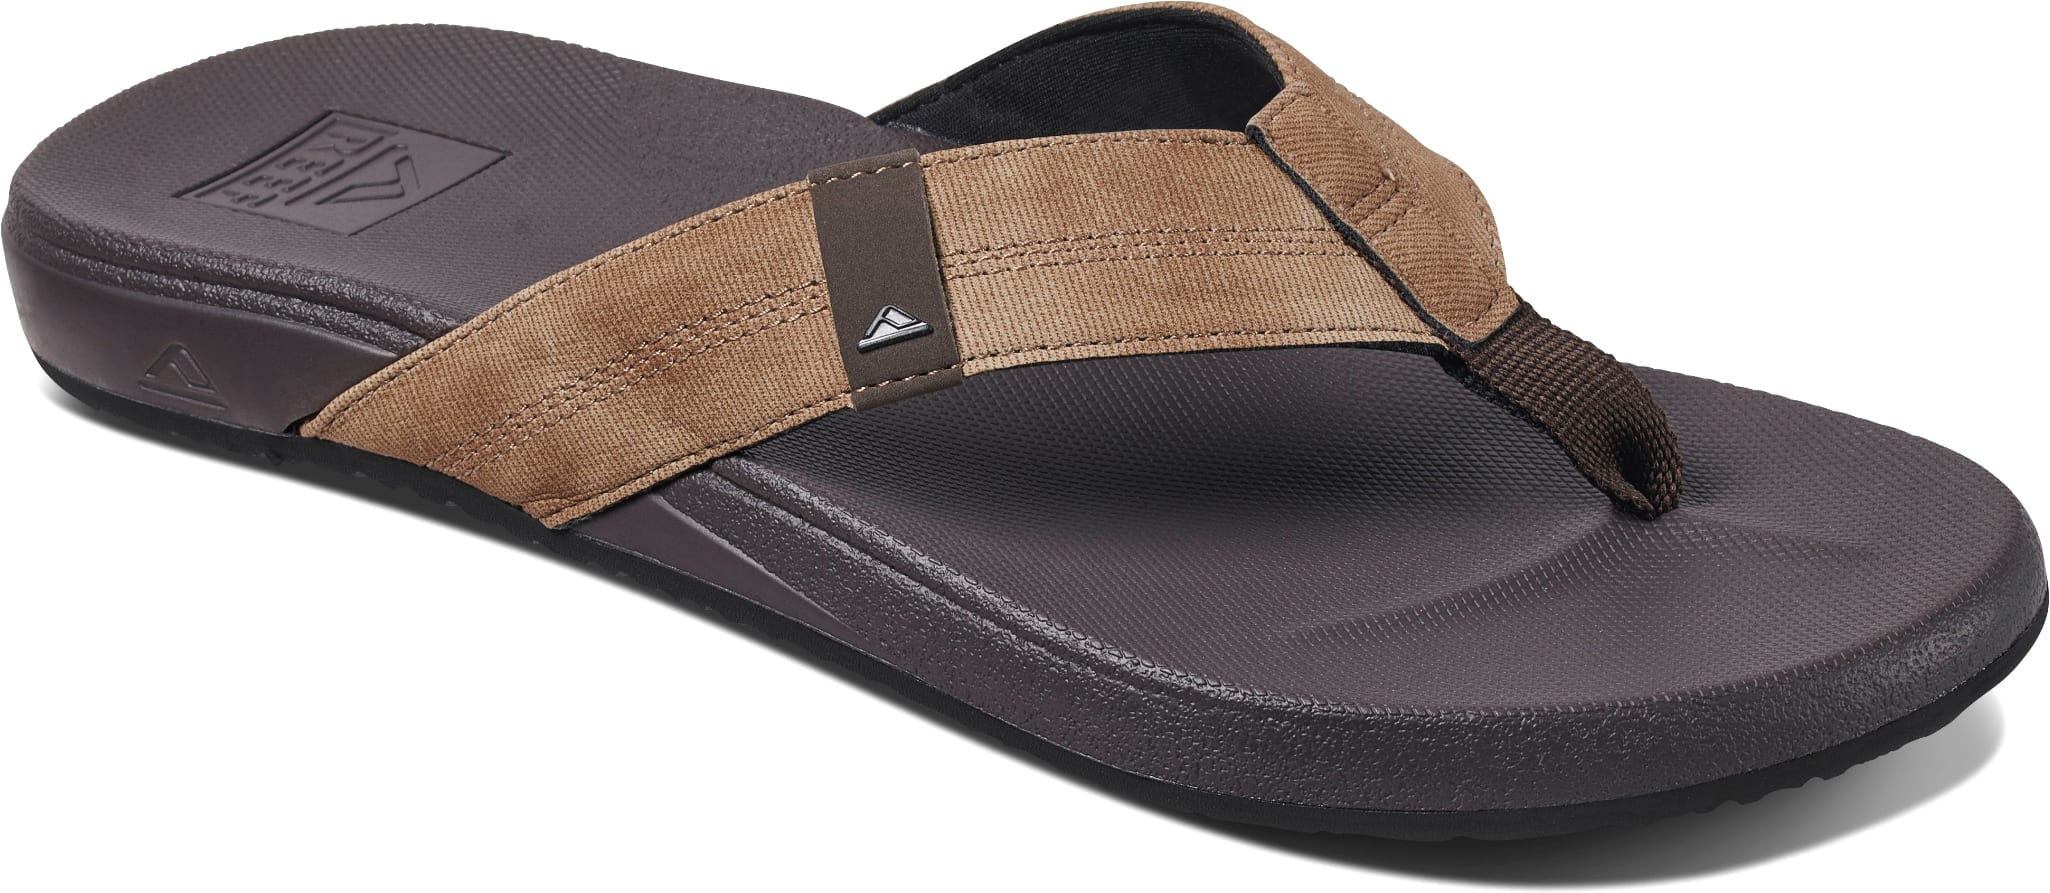 dad58c17aaca Reef Cushion Bounce Phantom Sandals - thumbnail 2